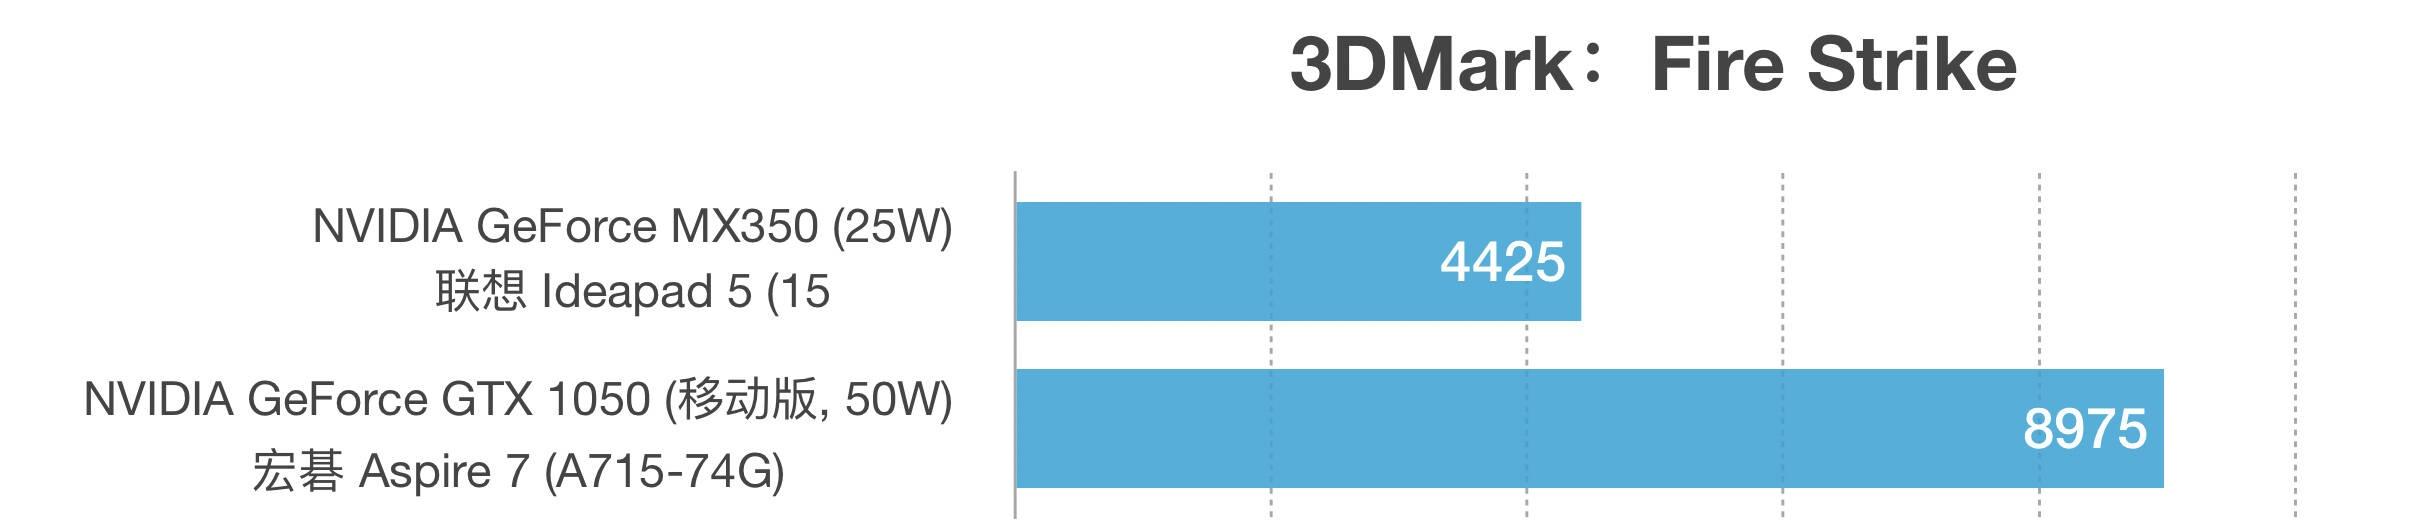 NVIDIA GeForce MX350和GTX 1050性能跑分对比评测